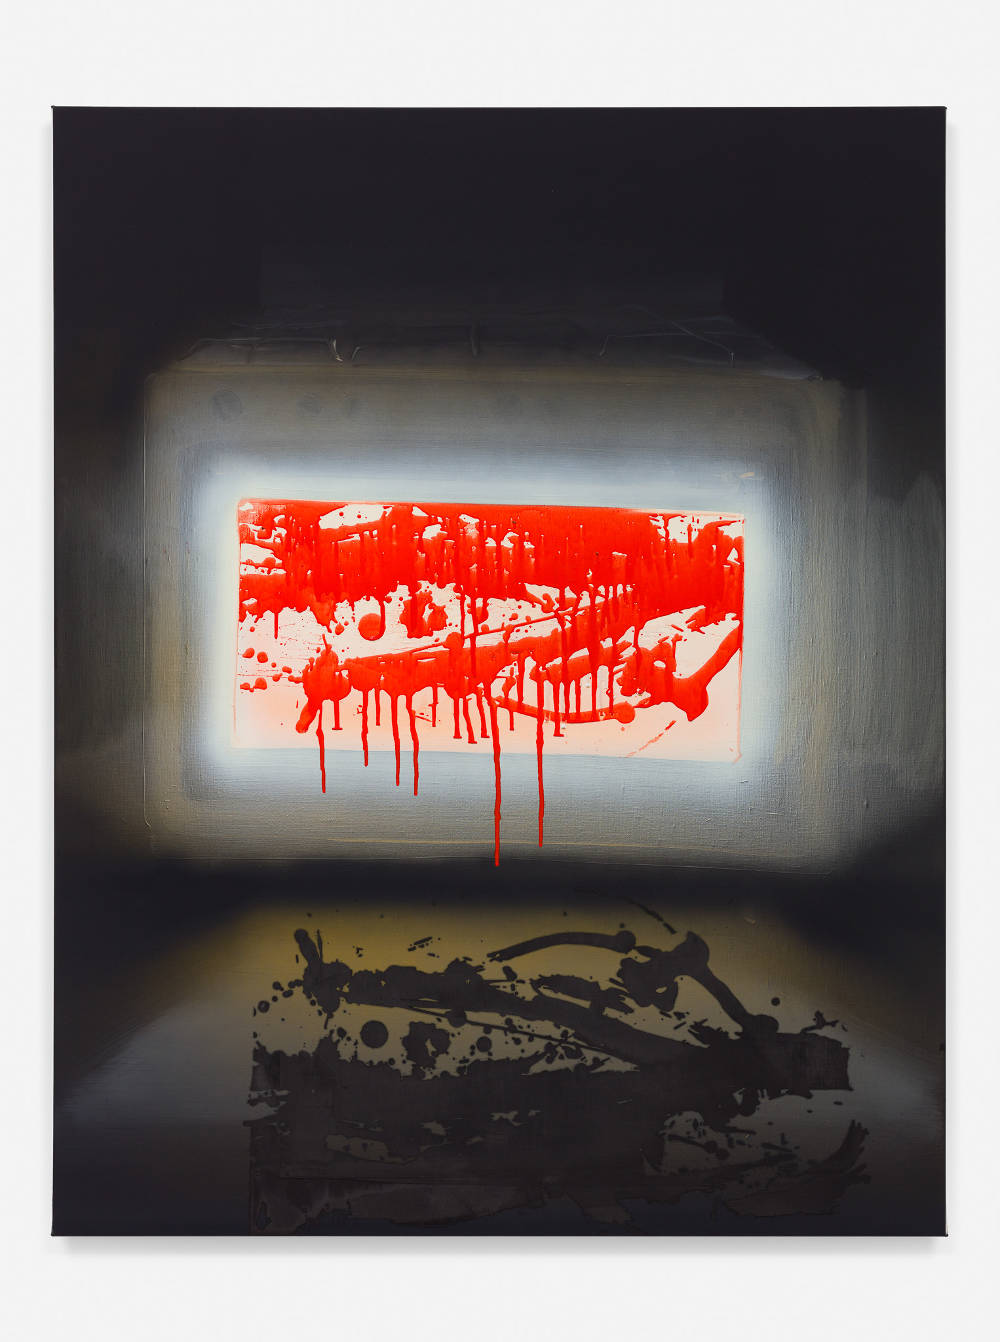 Tala Madani, Ovenburst II, 2018. Oil on linen 38 x 30 inches (96.5 x 76.2 cm) © Tala Madani, courtesy 303 Gallery, New York